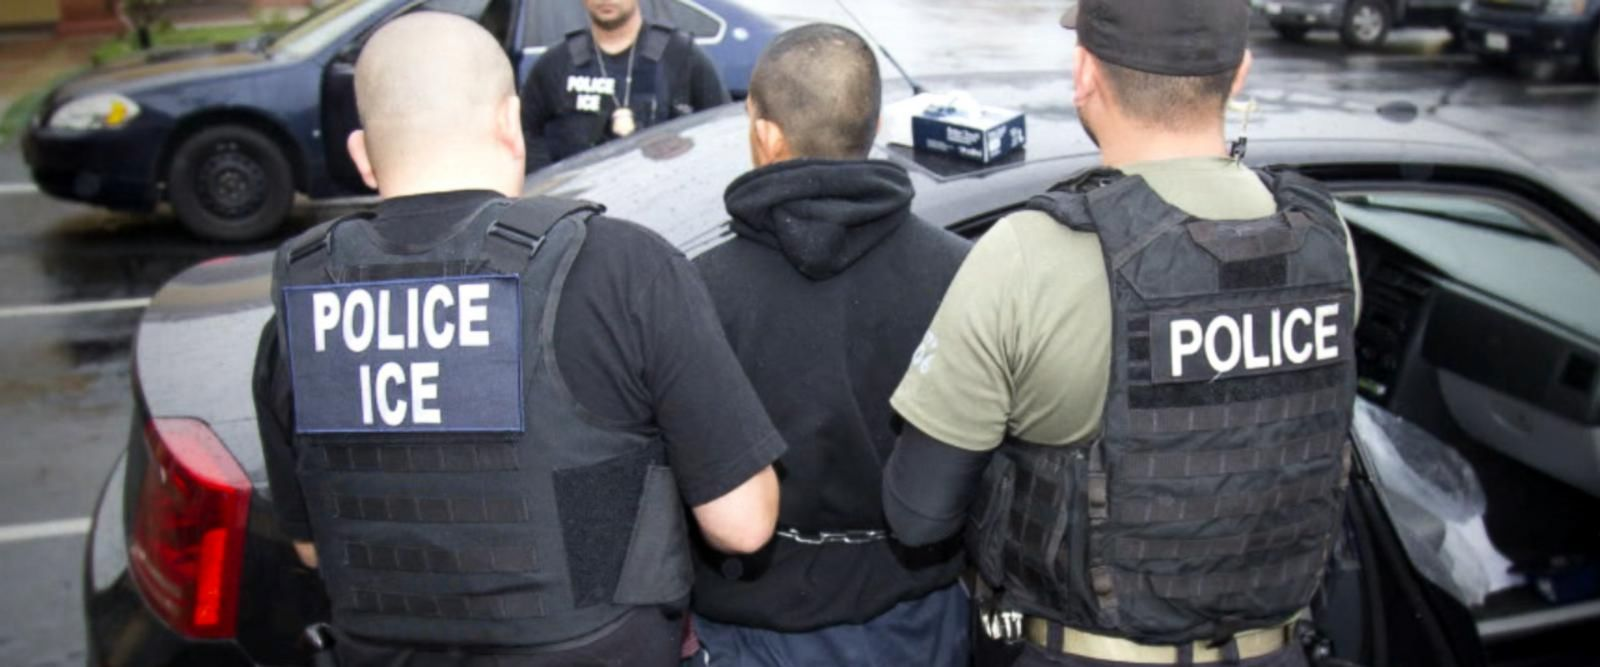 VIDEO: Targeted Raids Arrest Undocumented Immigrants